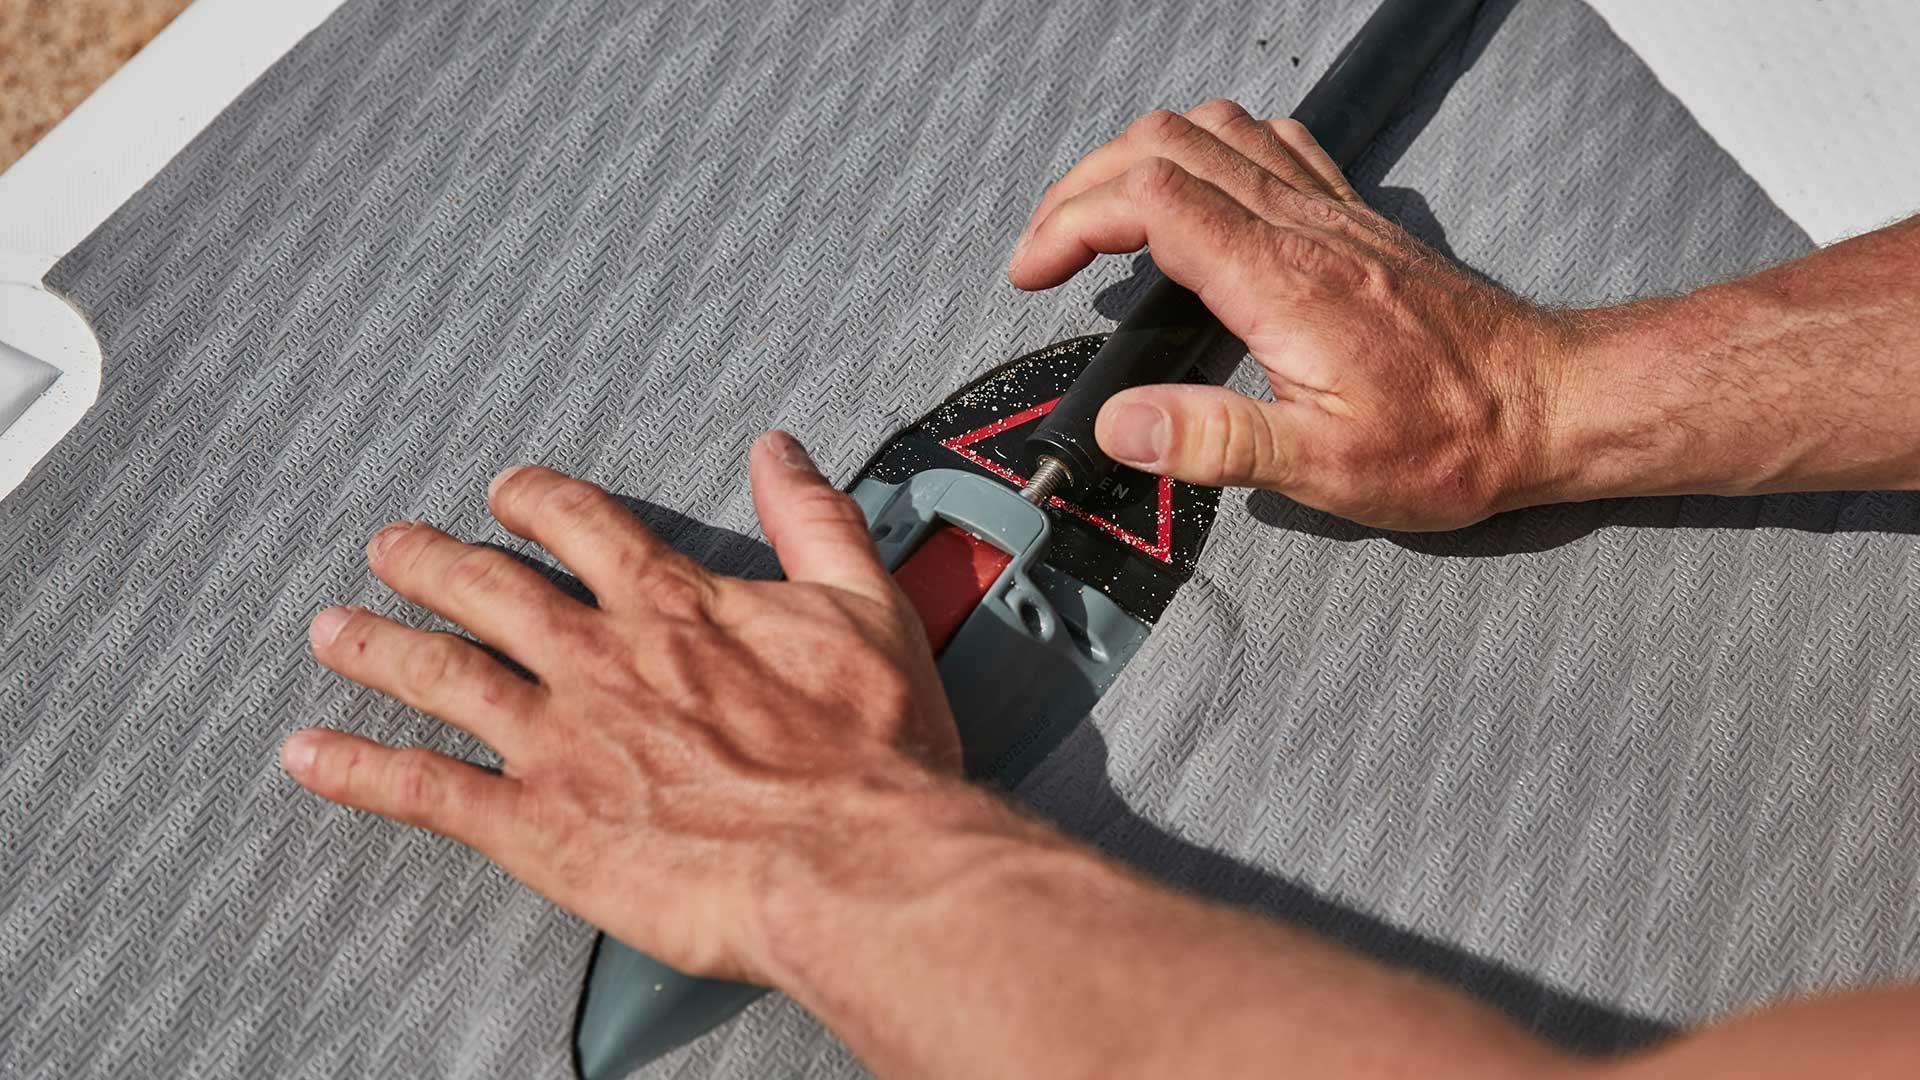 redpaddleco-126-x-26-elite-inflatable-paddle-board-desktop-gallery-valve